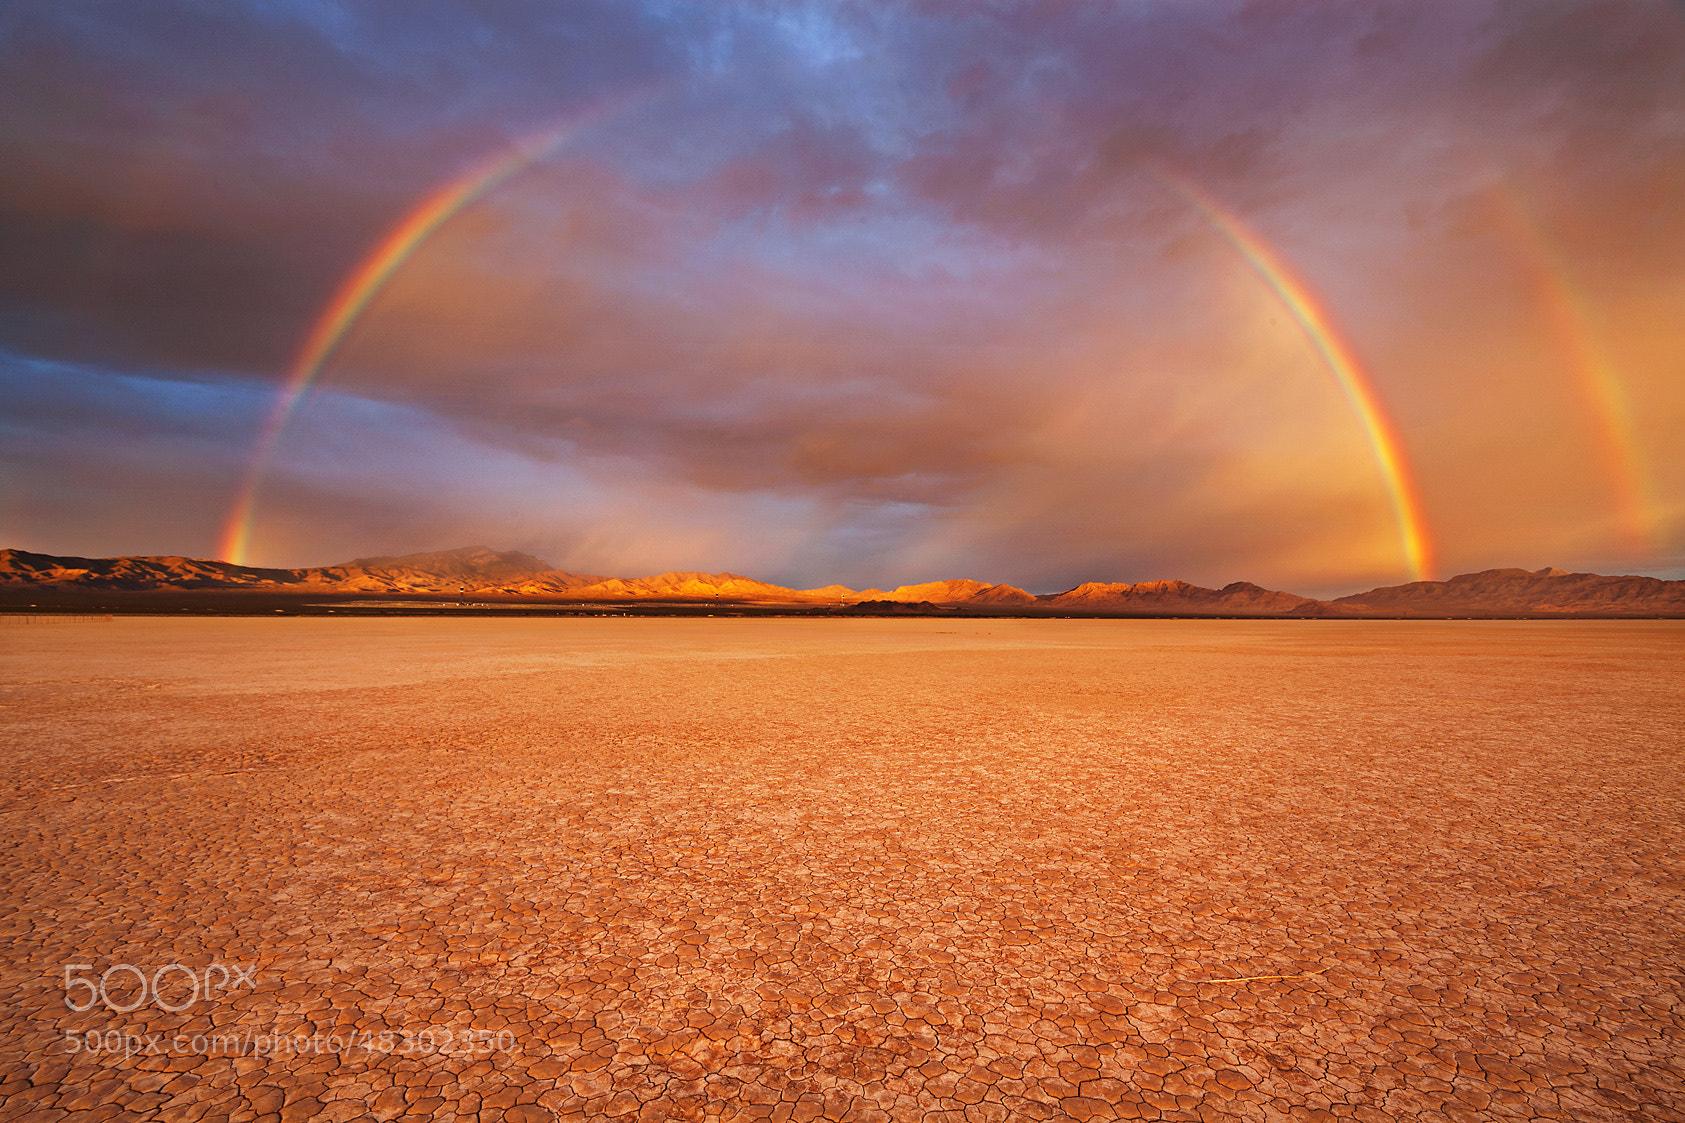 Photograph California Desert Rainbow by Chad Ward on 500px